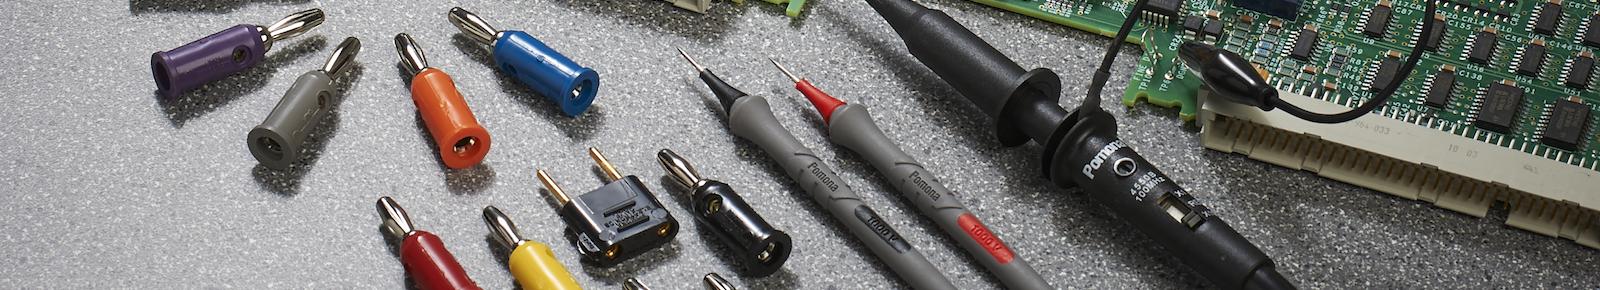 Low Voltage Spade Lug, Shielded Cable | Pomona Electronics